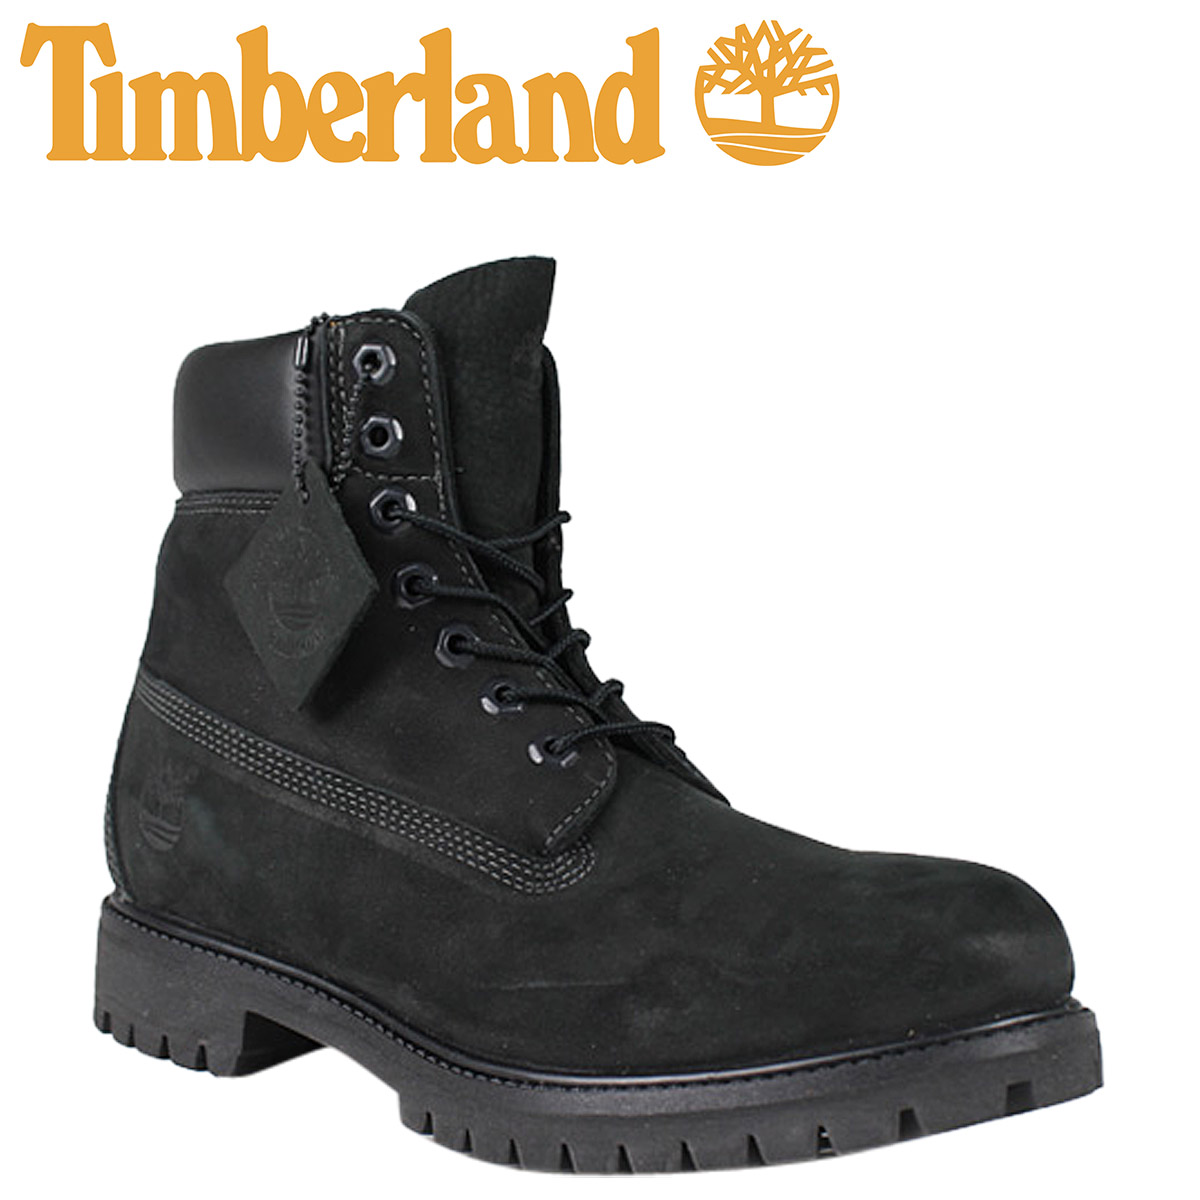 timberland men's 6-inch premium waterproof boots black nubuck